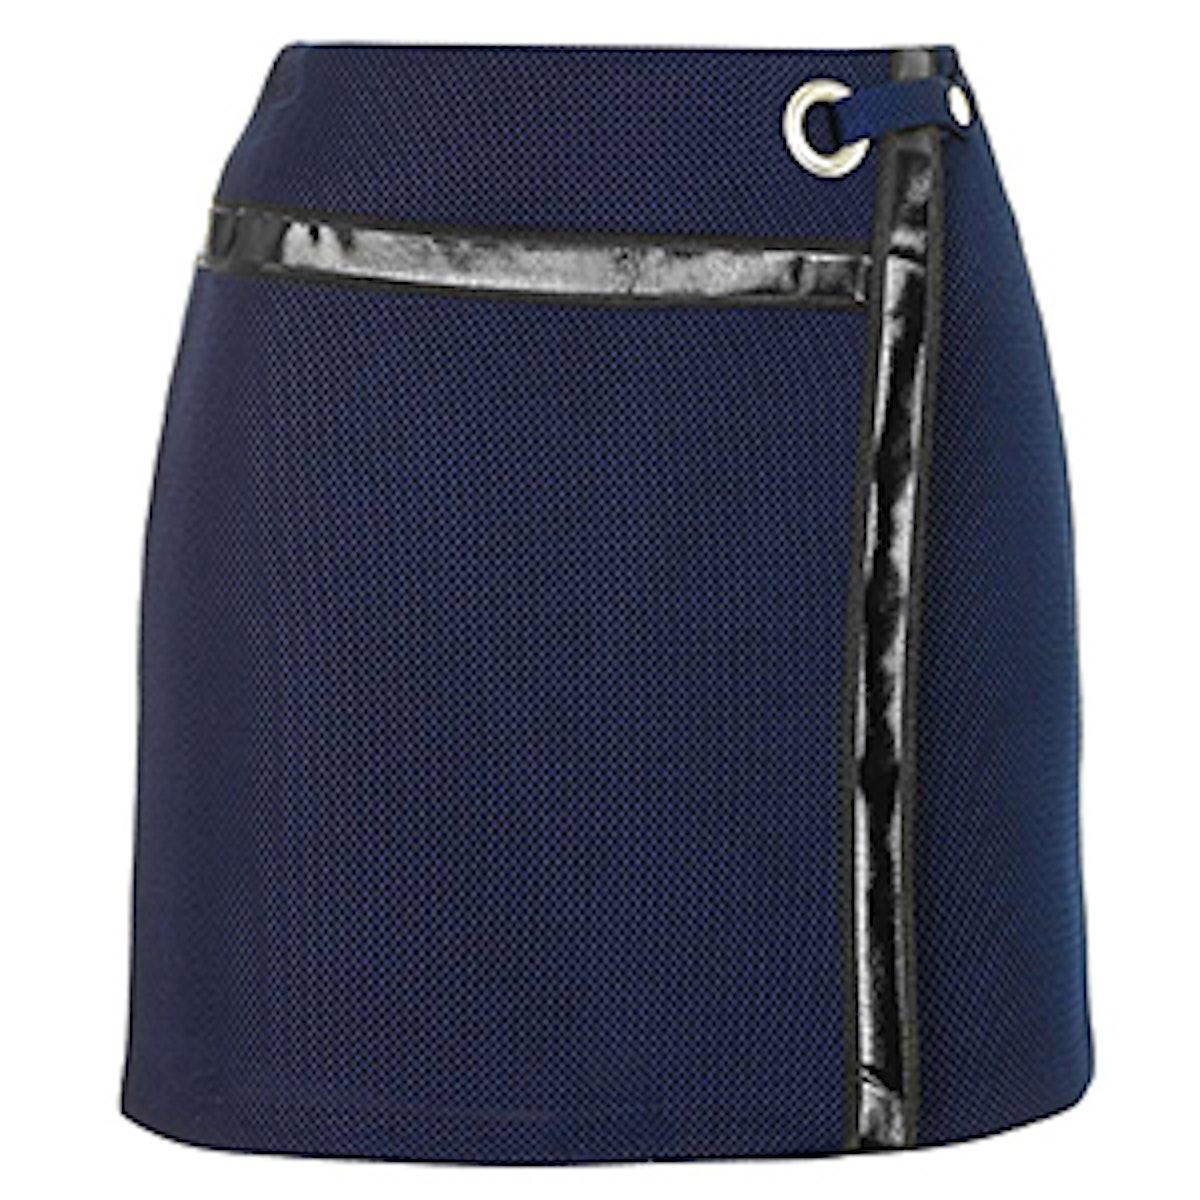 Tape Airtex Skirt